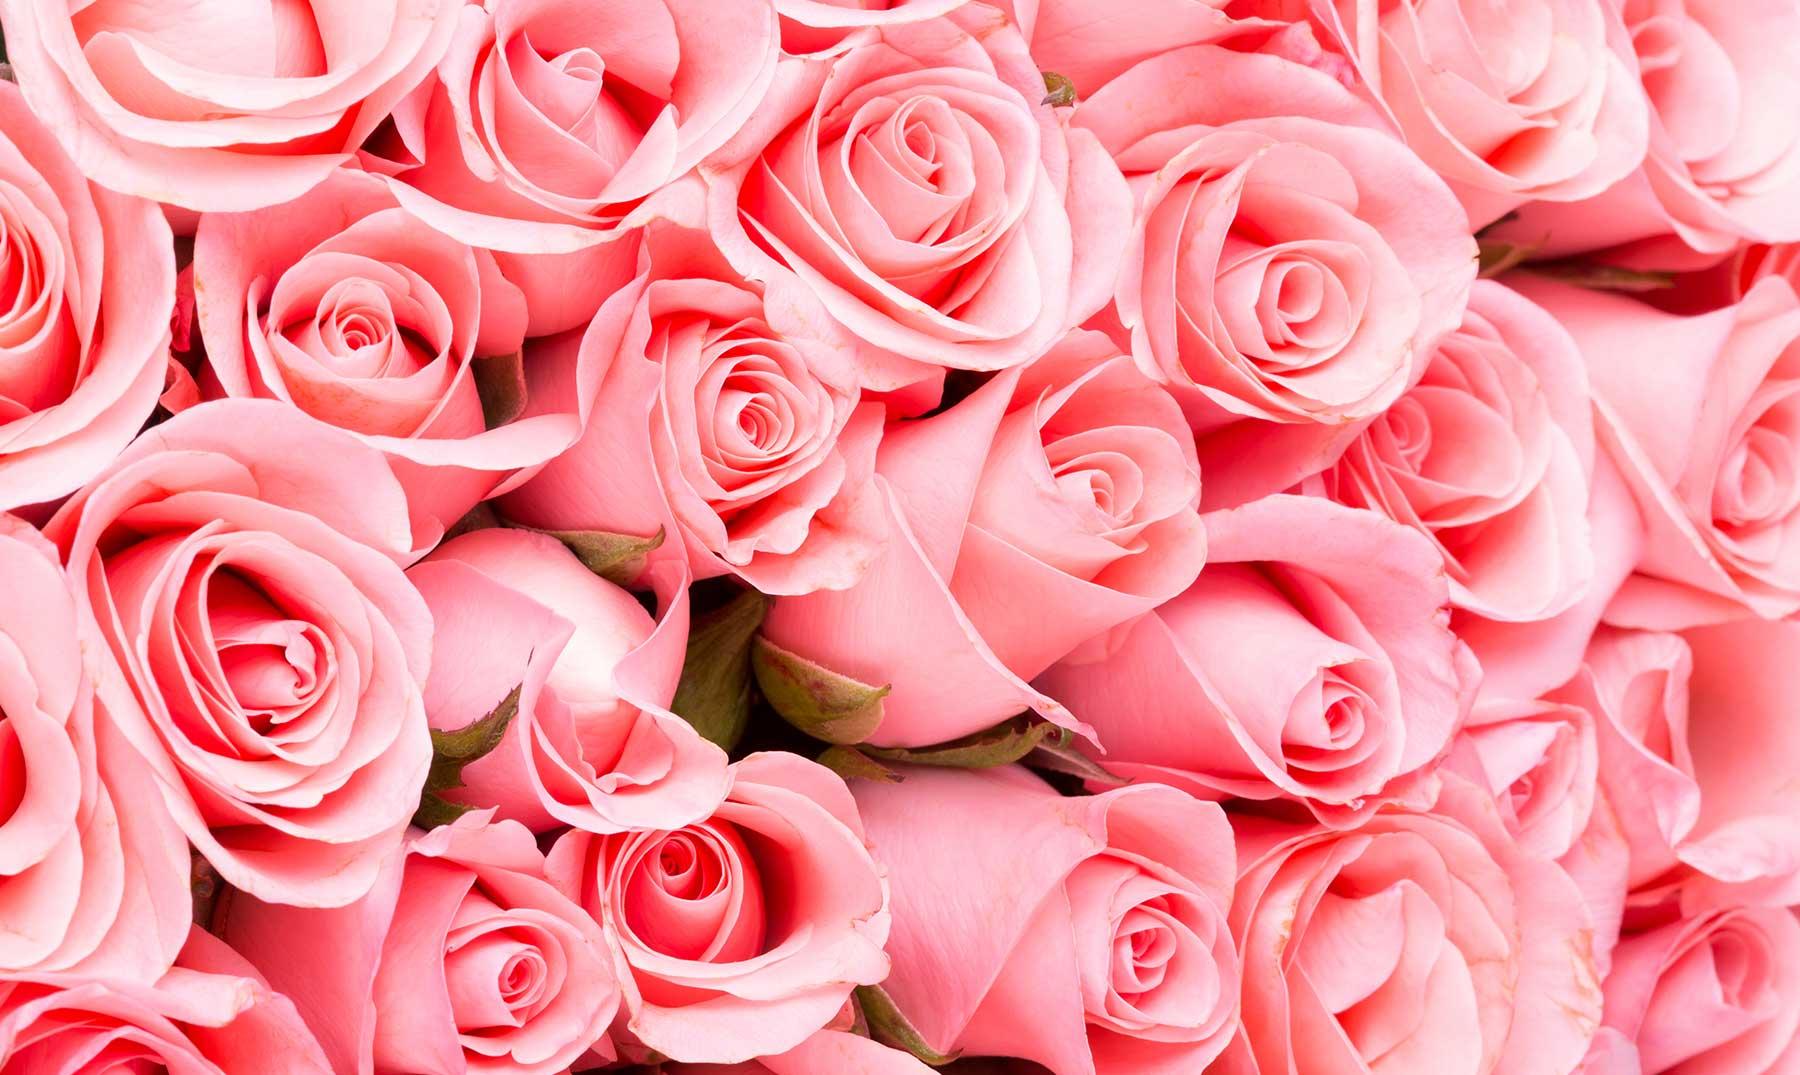 soñar con rosas rosas